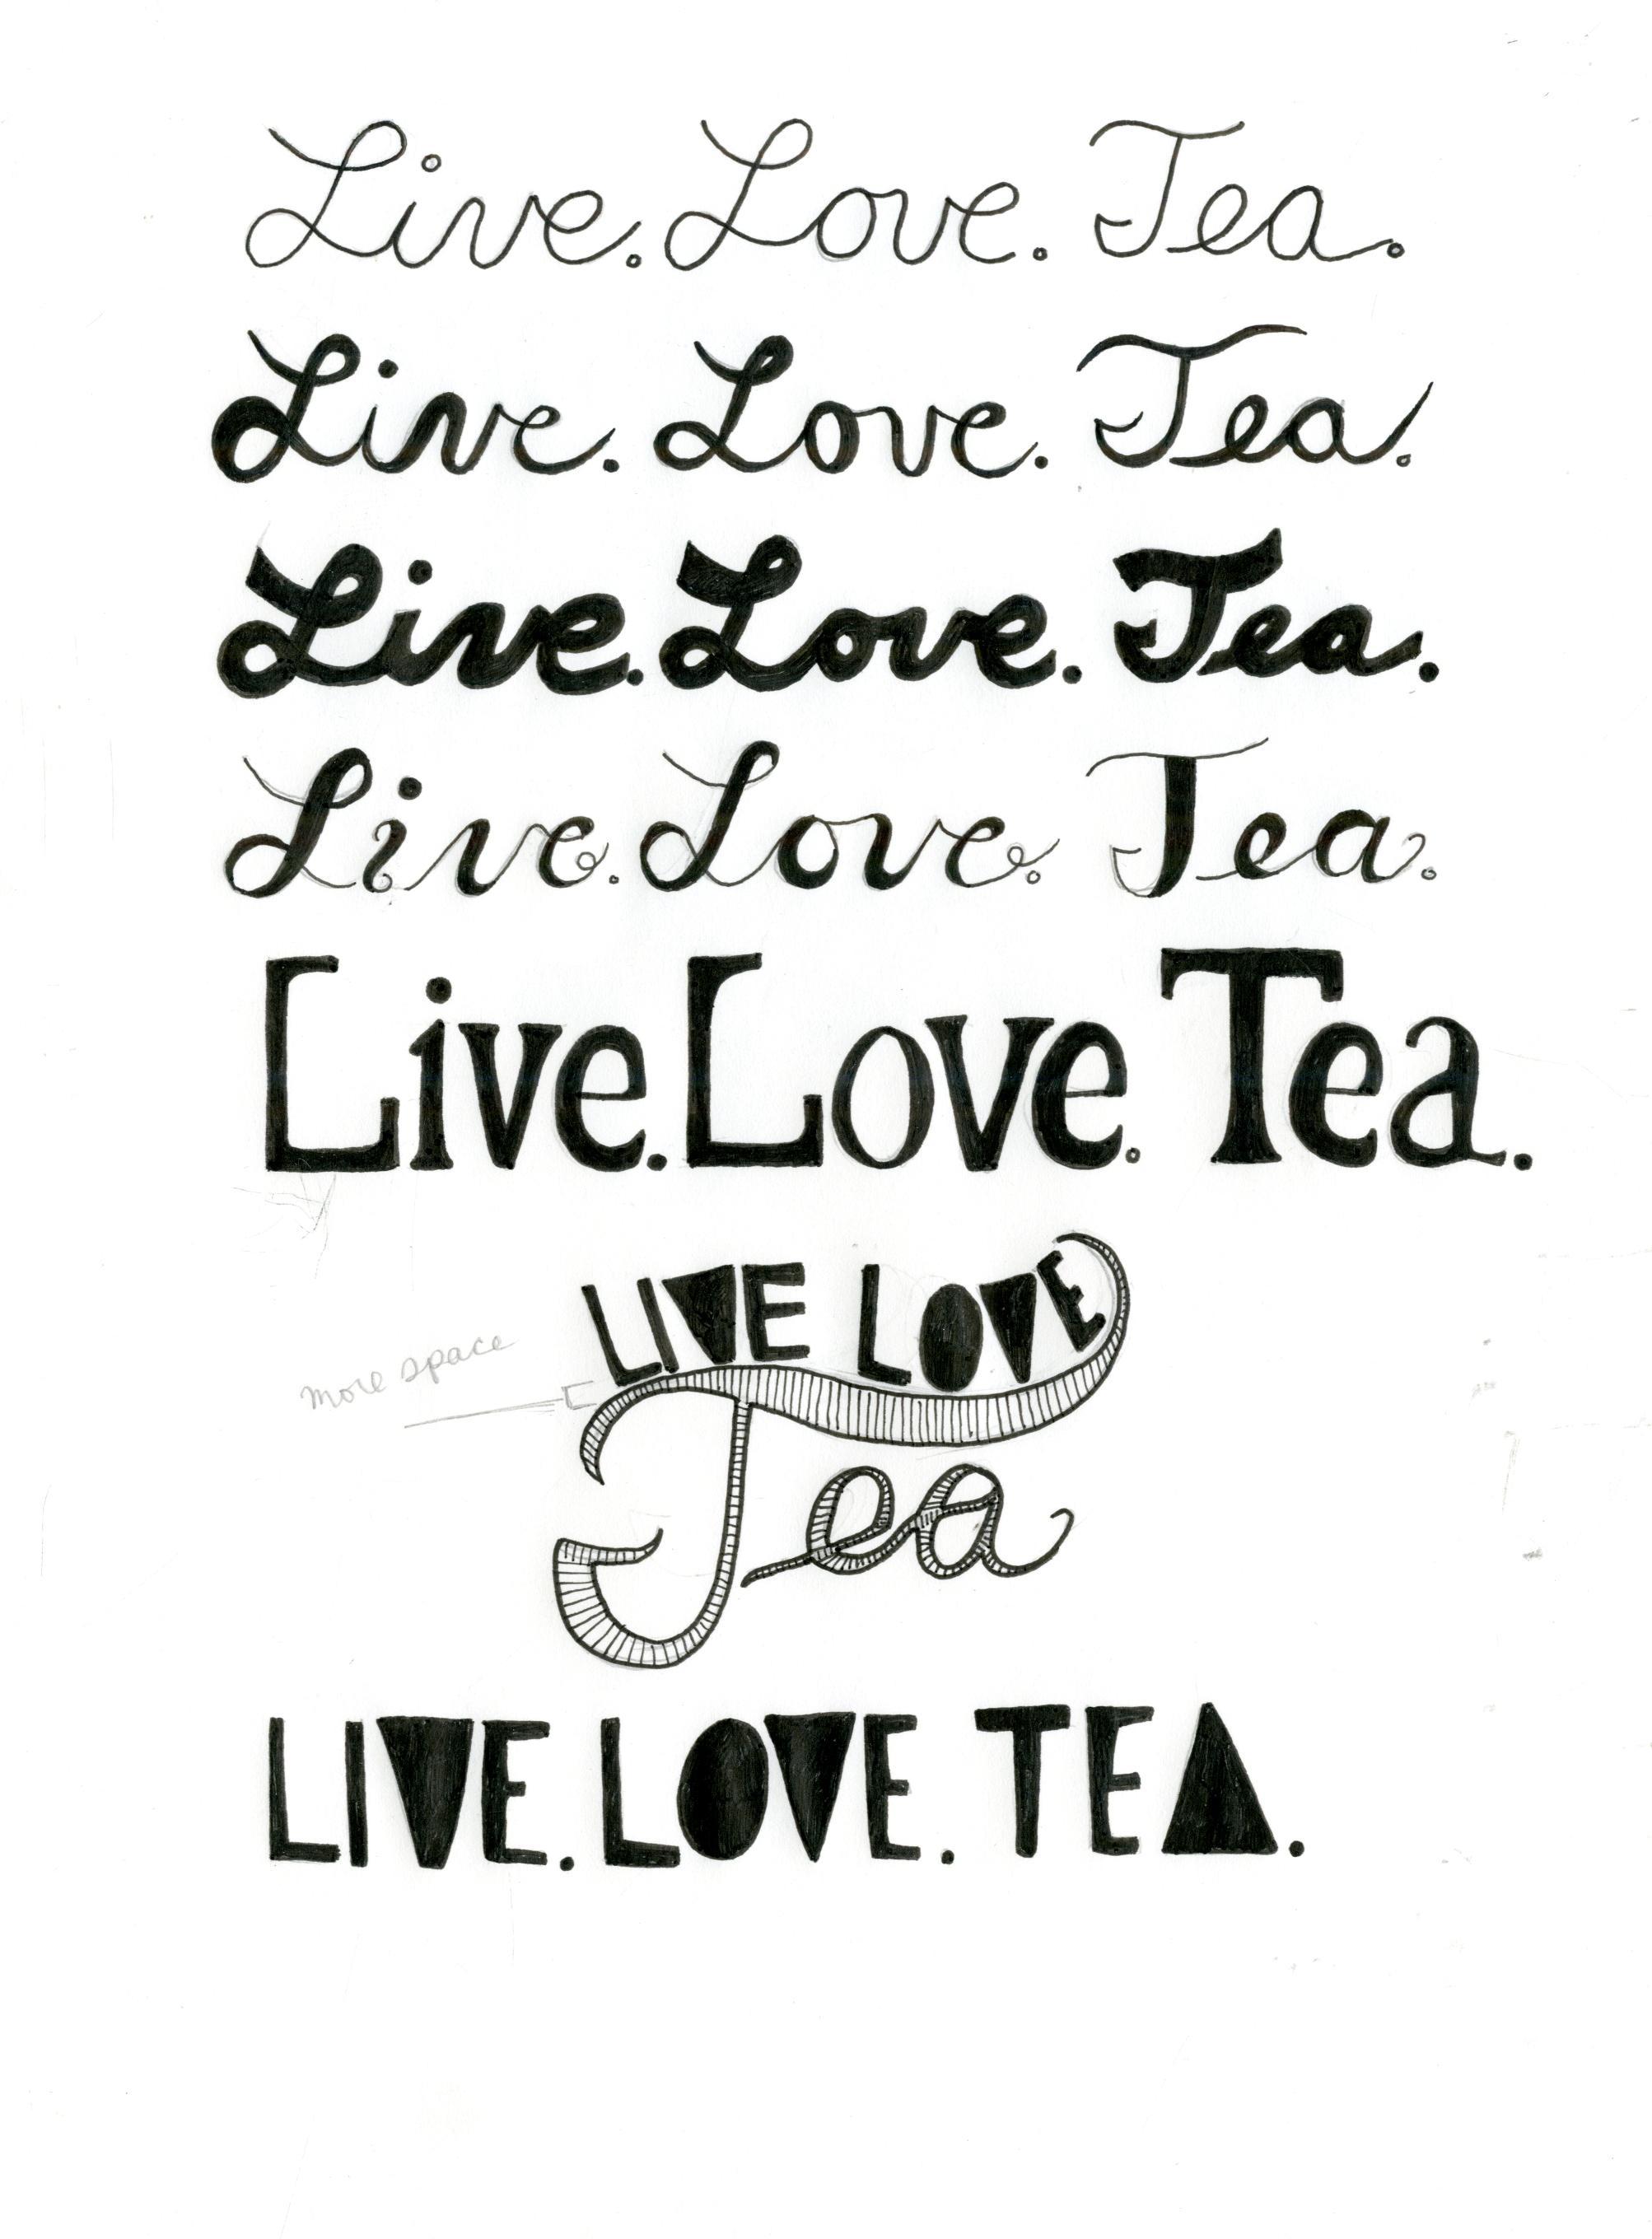 Live.Love.Tea. - image 5 - student project